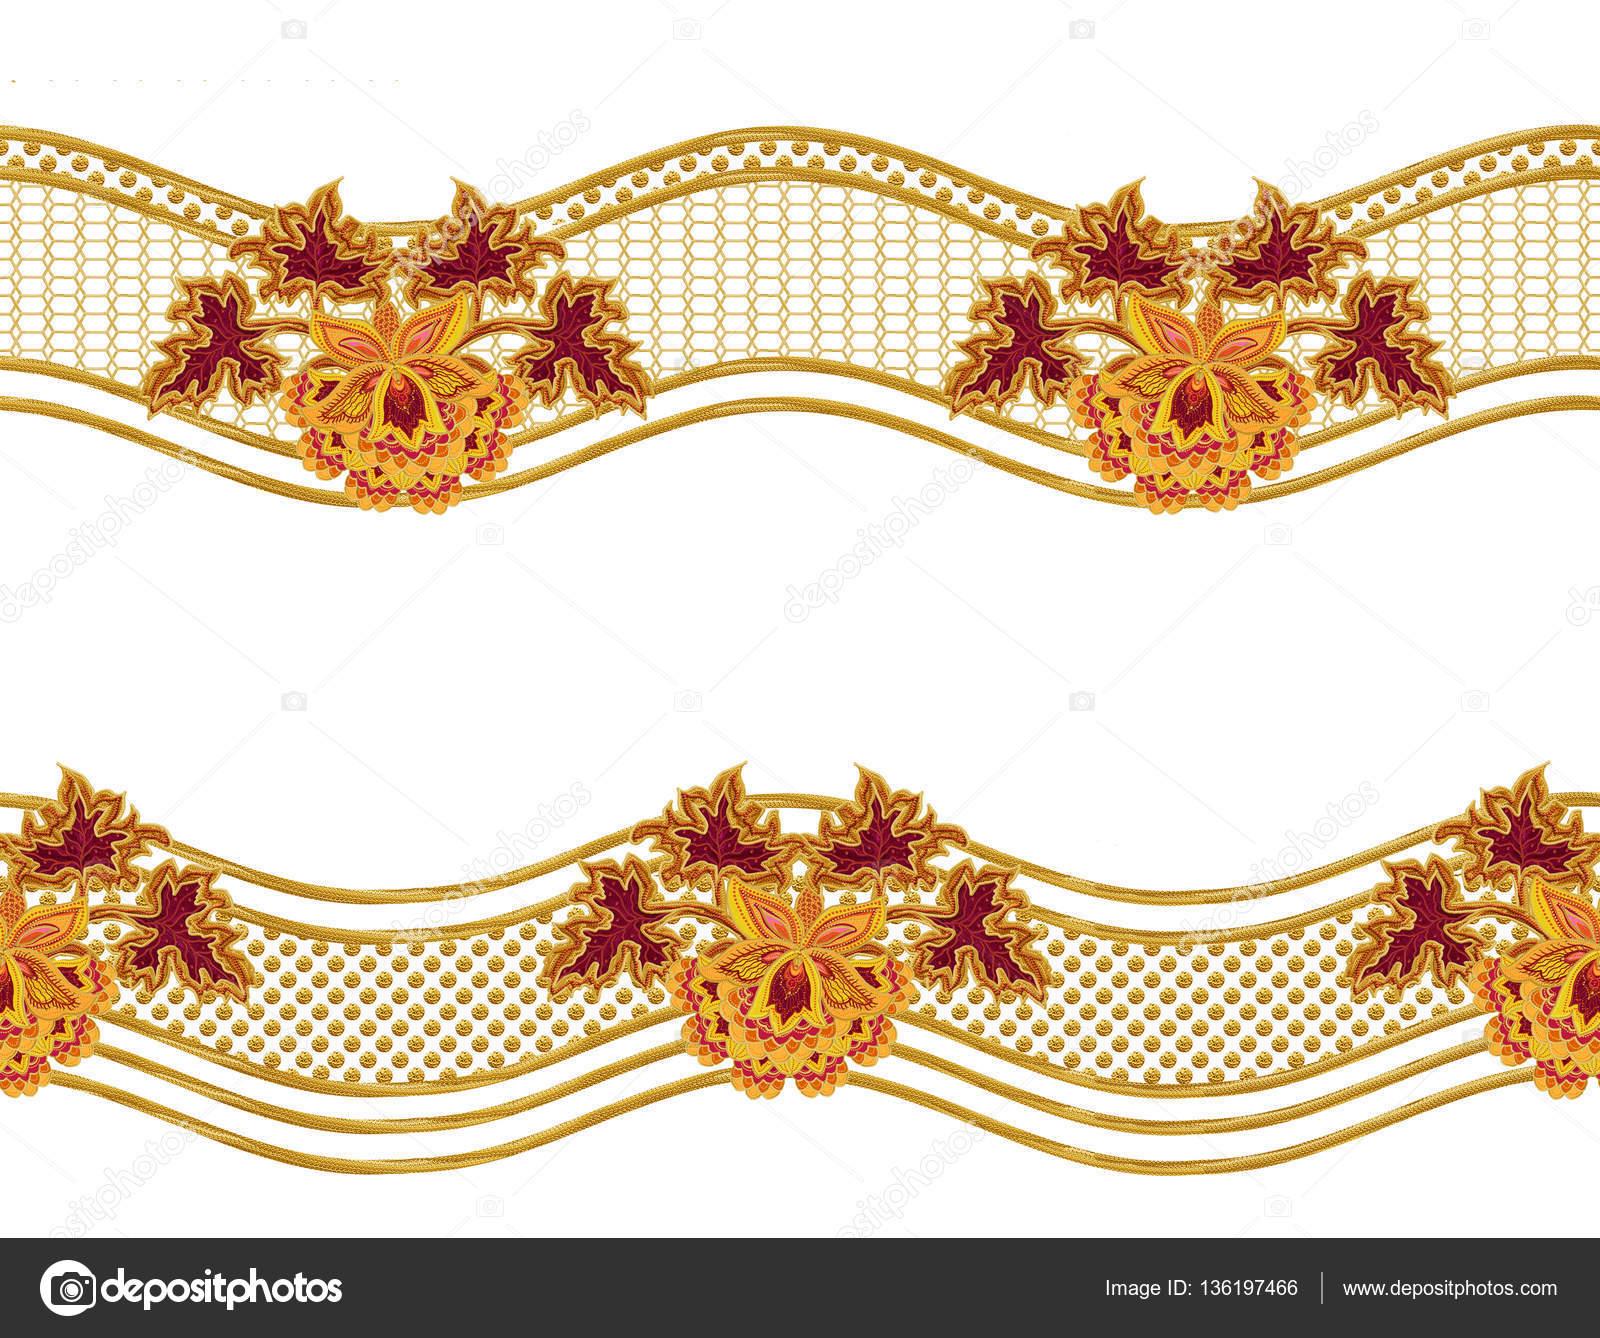 Gold weaving clipart #2